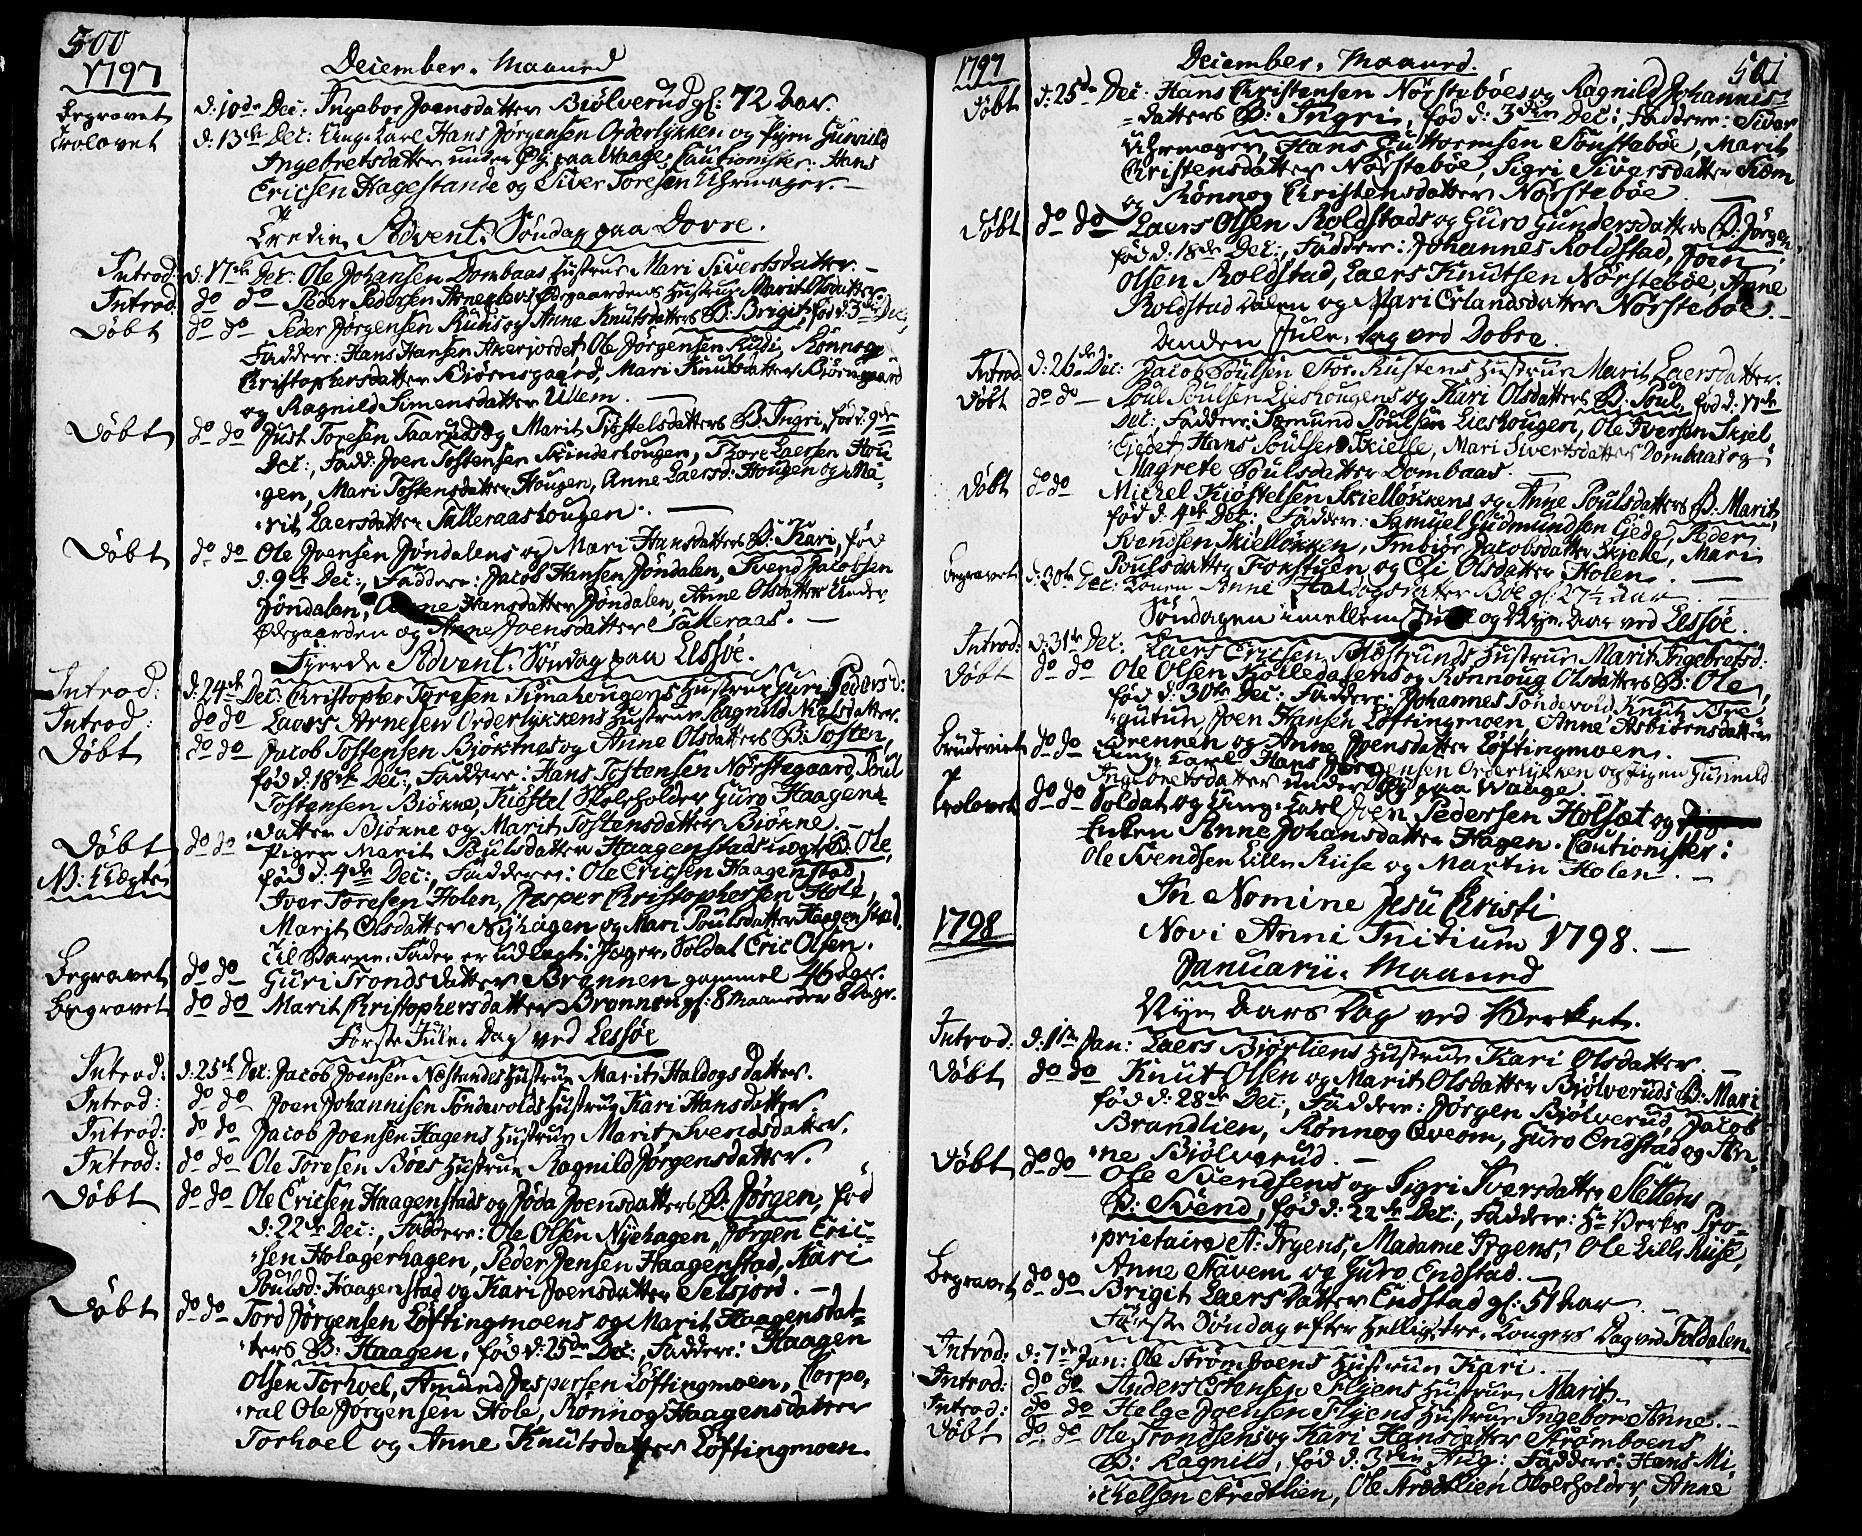 SAH, Lesja prestekontor, Ministerialbok nr. 3, 1777-1819, s. 500-501